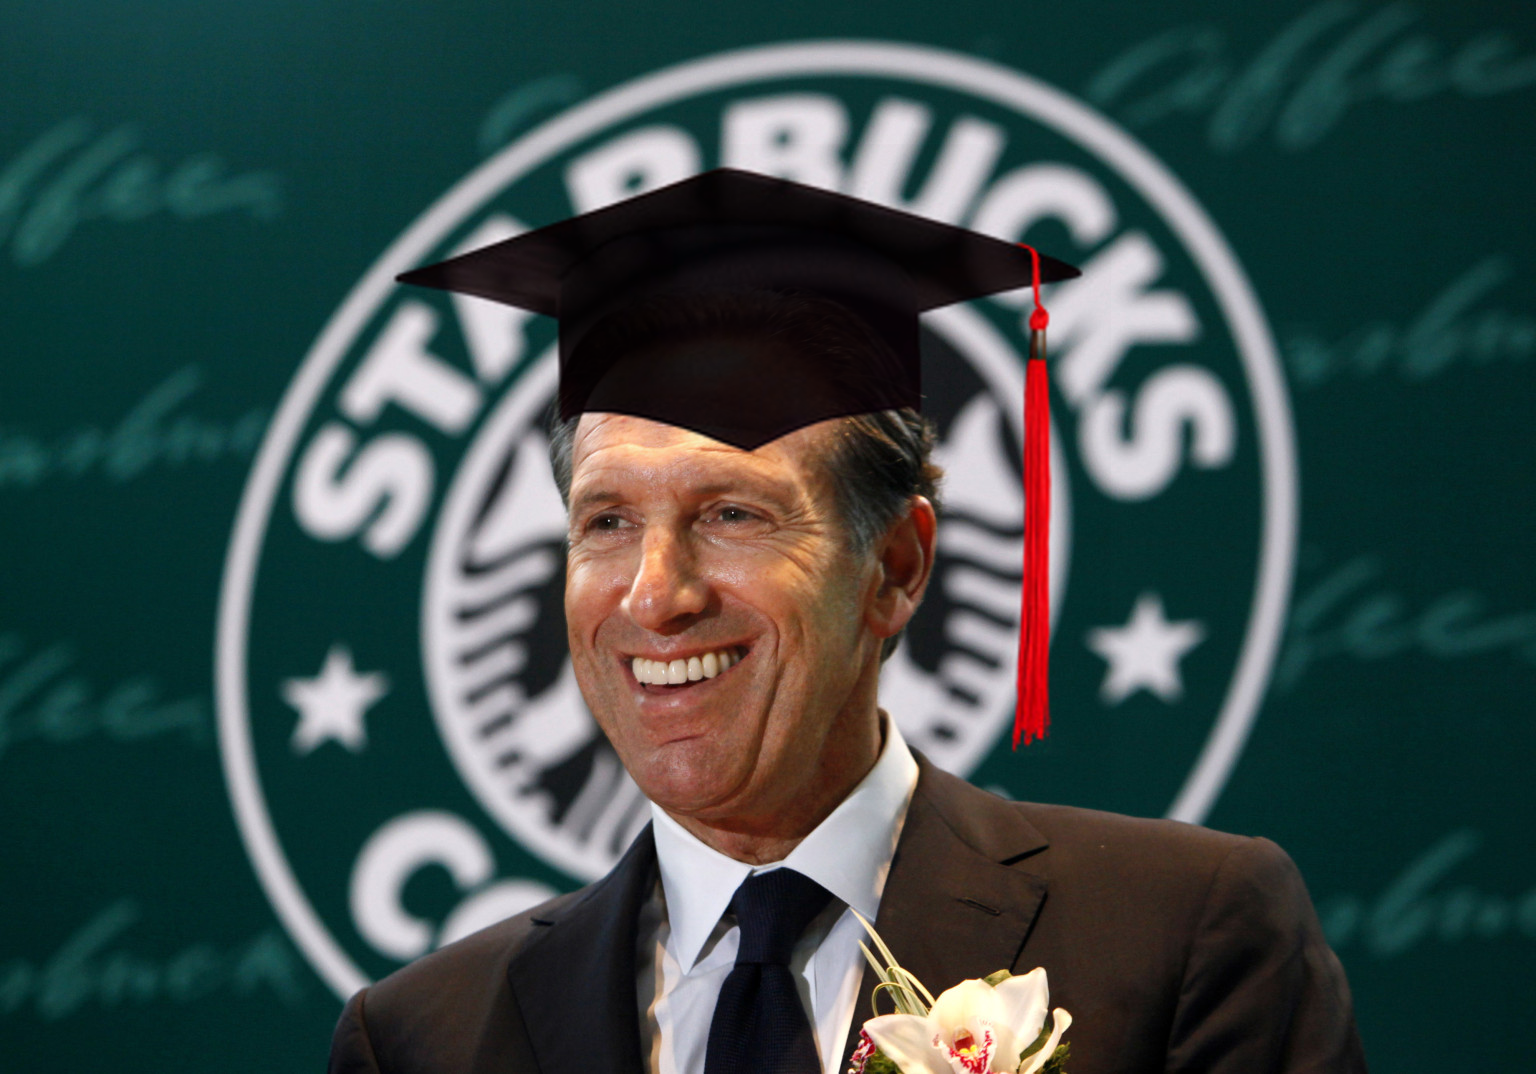 Starbucks Demonstrates Servant Leadership with Free Education